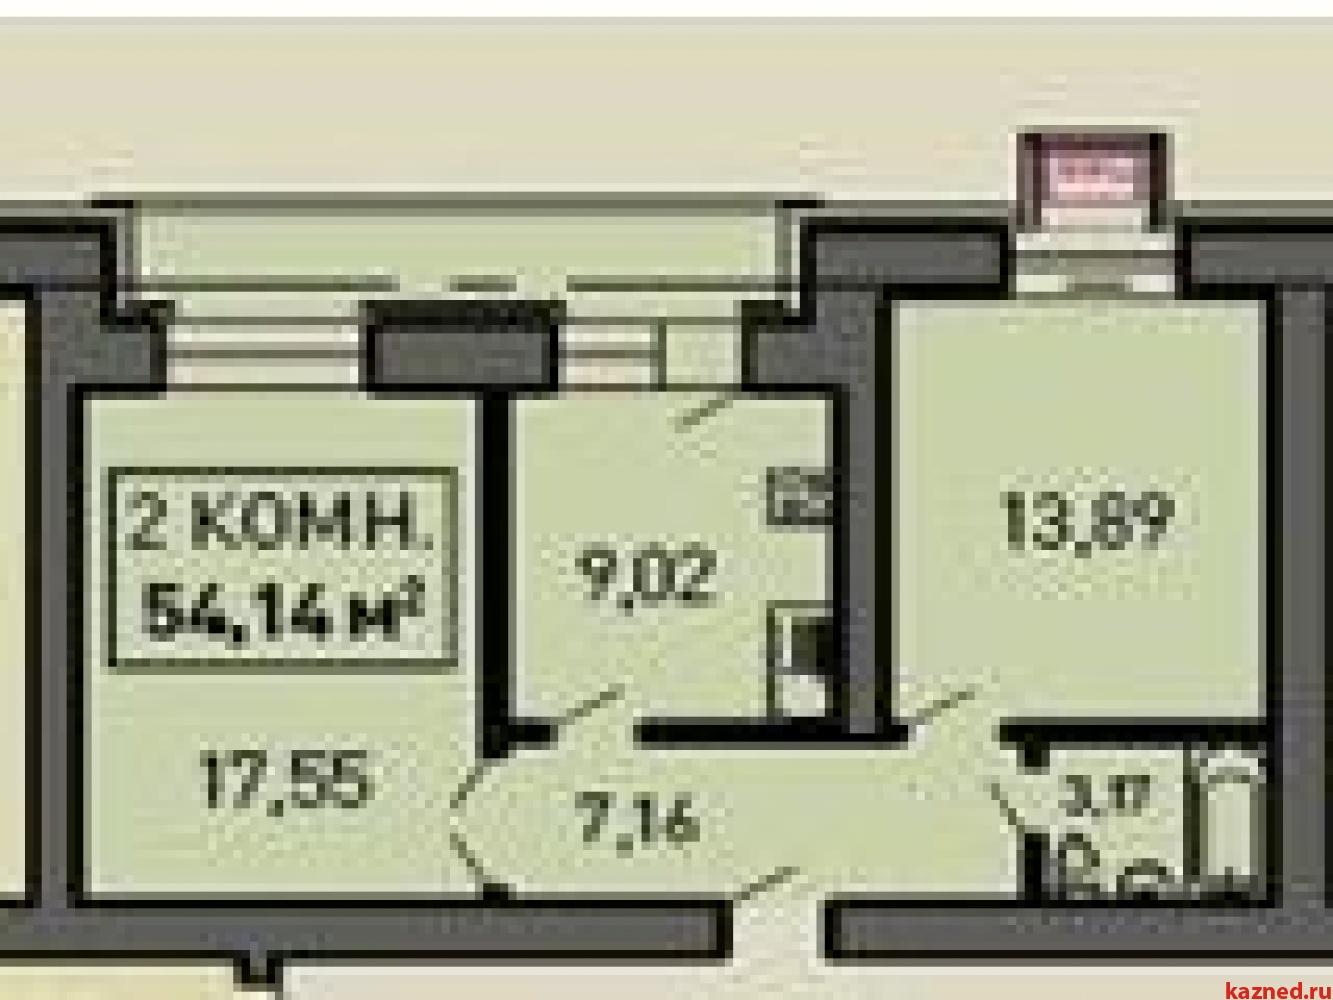 Продажа 2-к квартиры Лукина д.52, 53 м²  (миниатюра №1)